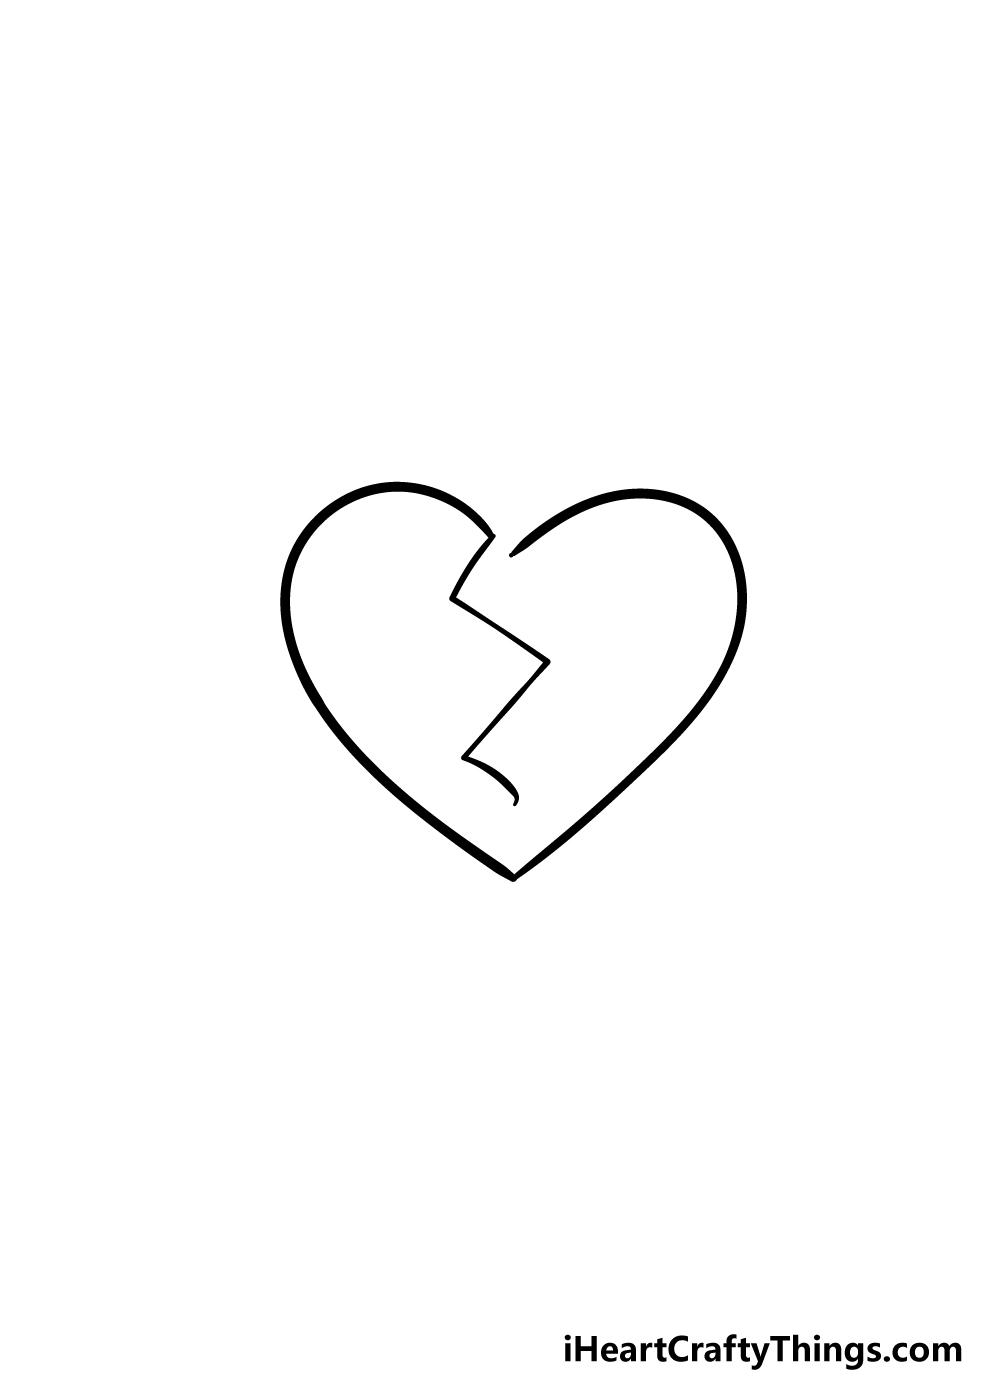 broken heart drawing step 4